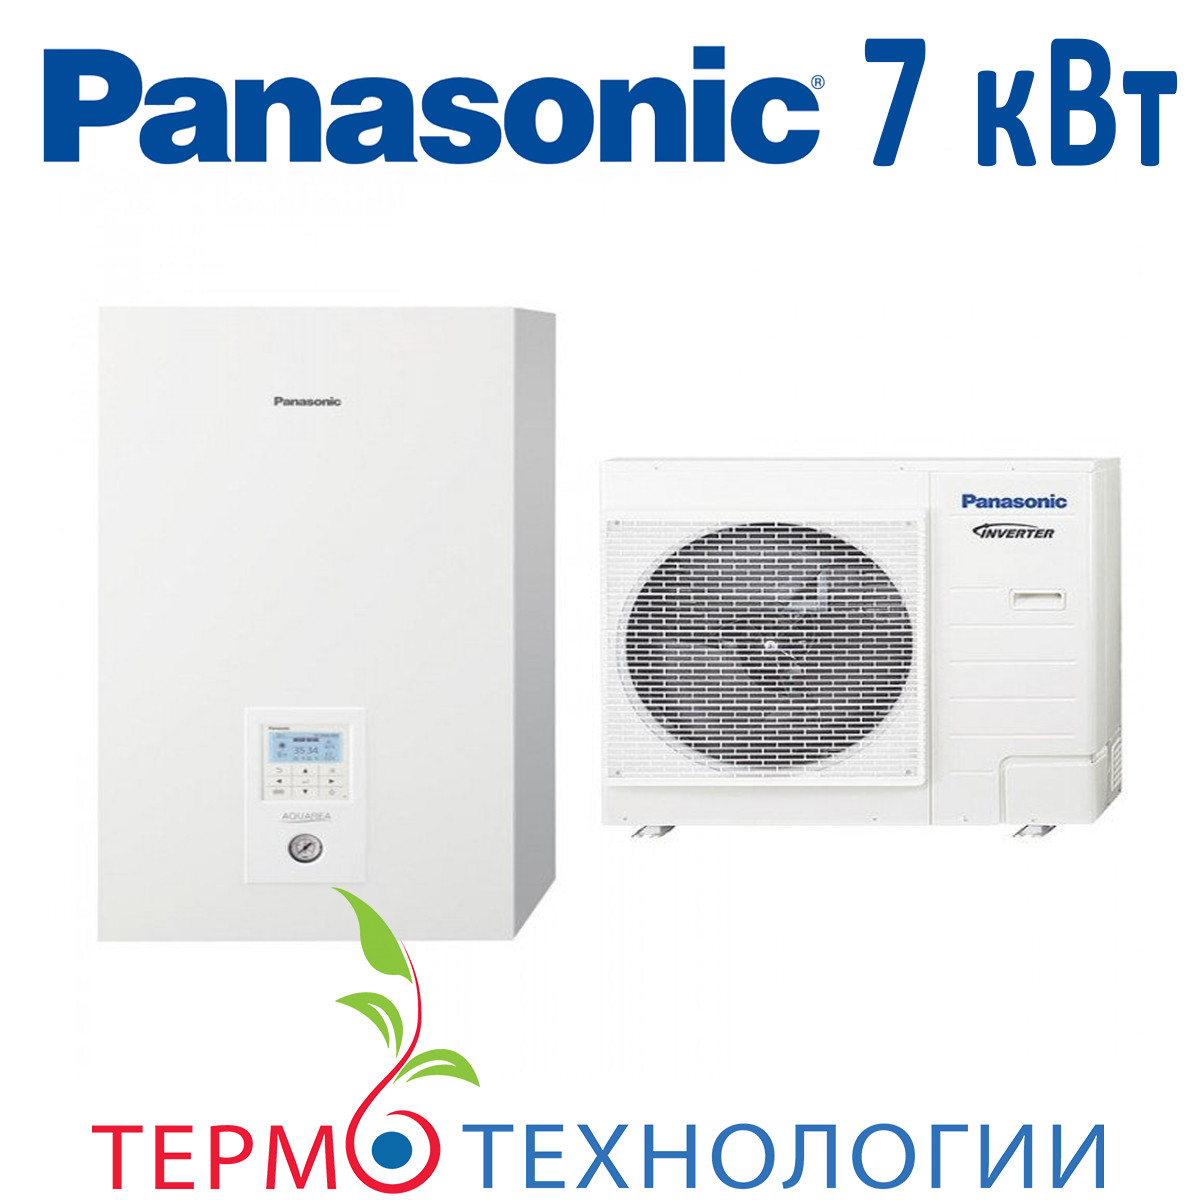 Тепловой насос воздух-вода Panasonic 7 кВт HP с гидромодулем